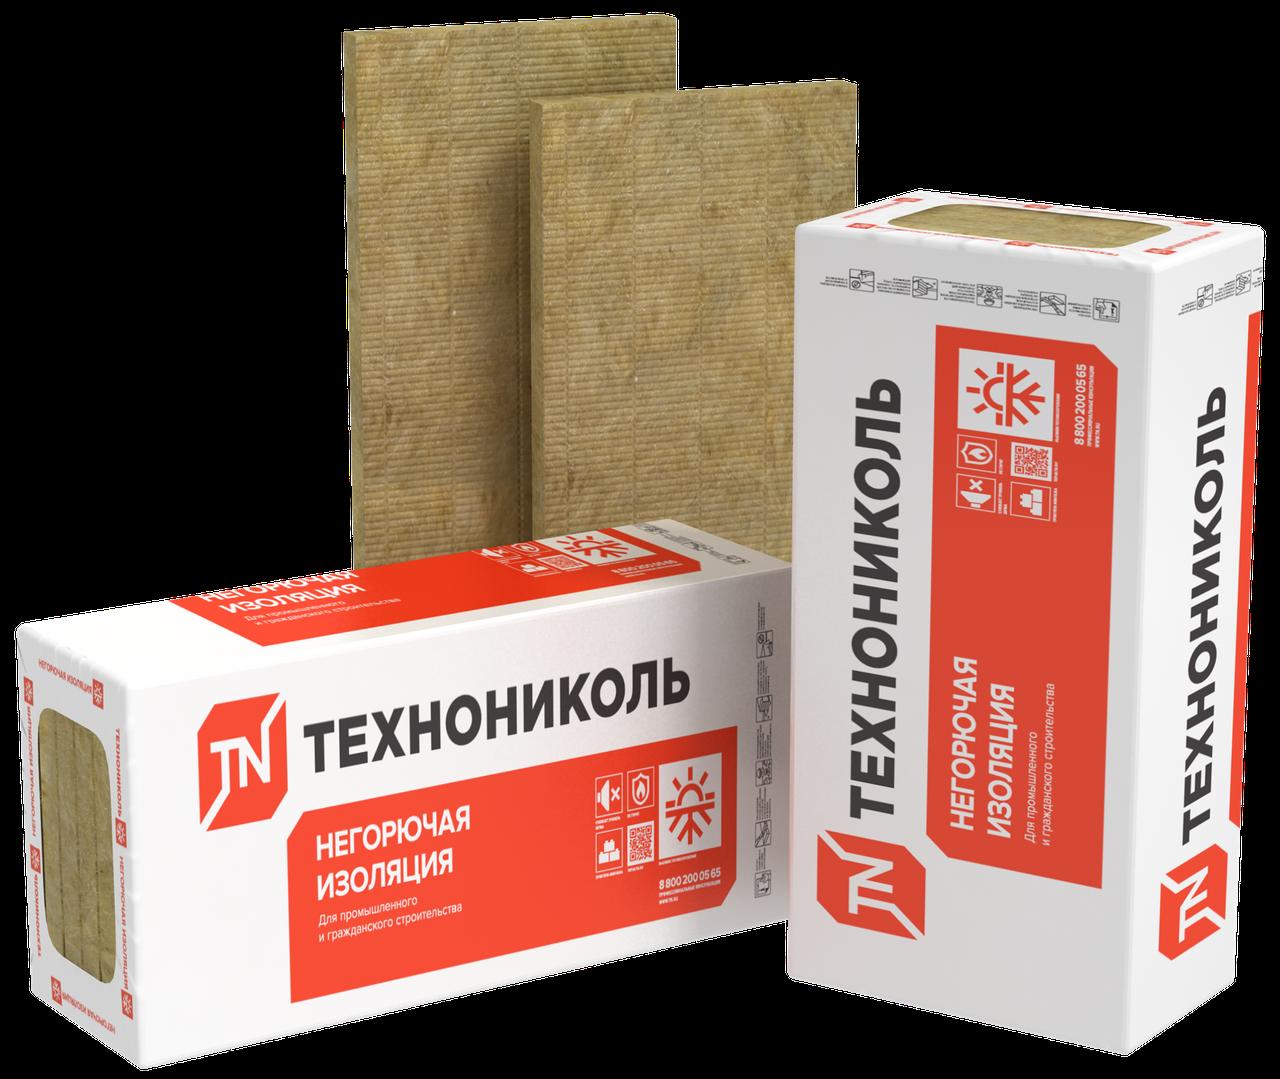 Вата мінеральна Sweetondale Технофас Оптима, 120 кг/куб.м 100 мм